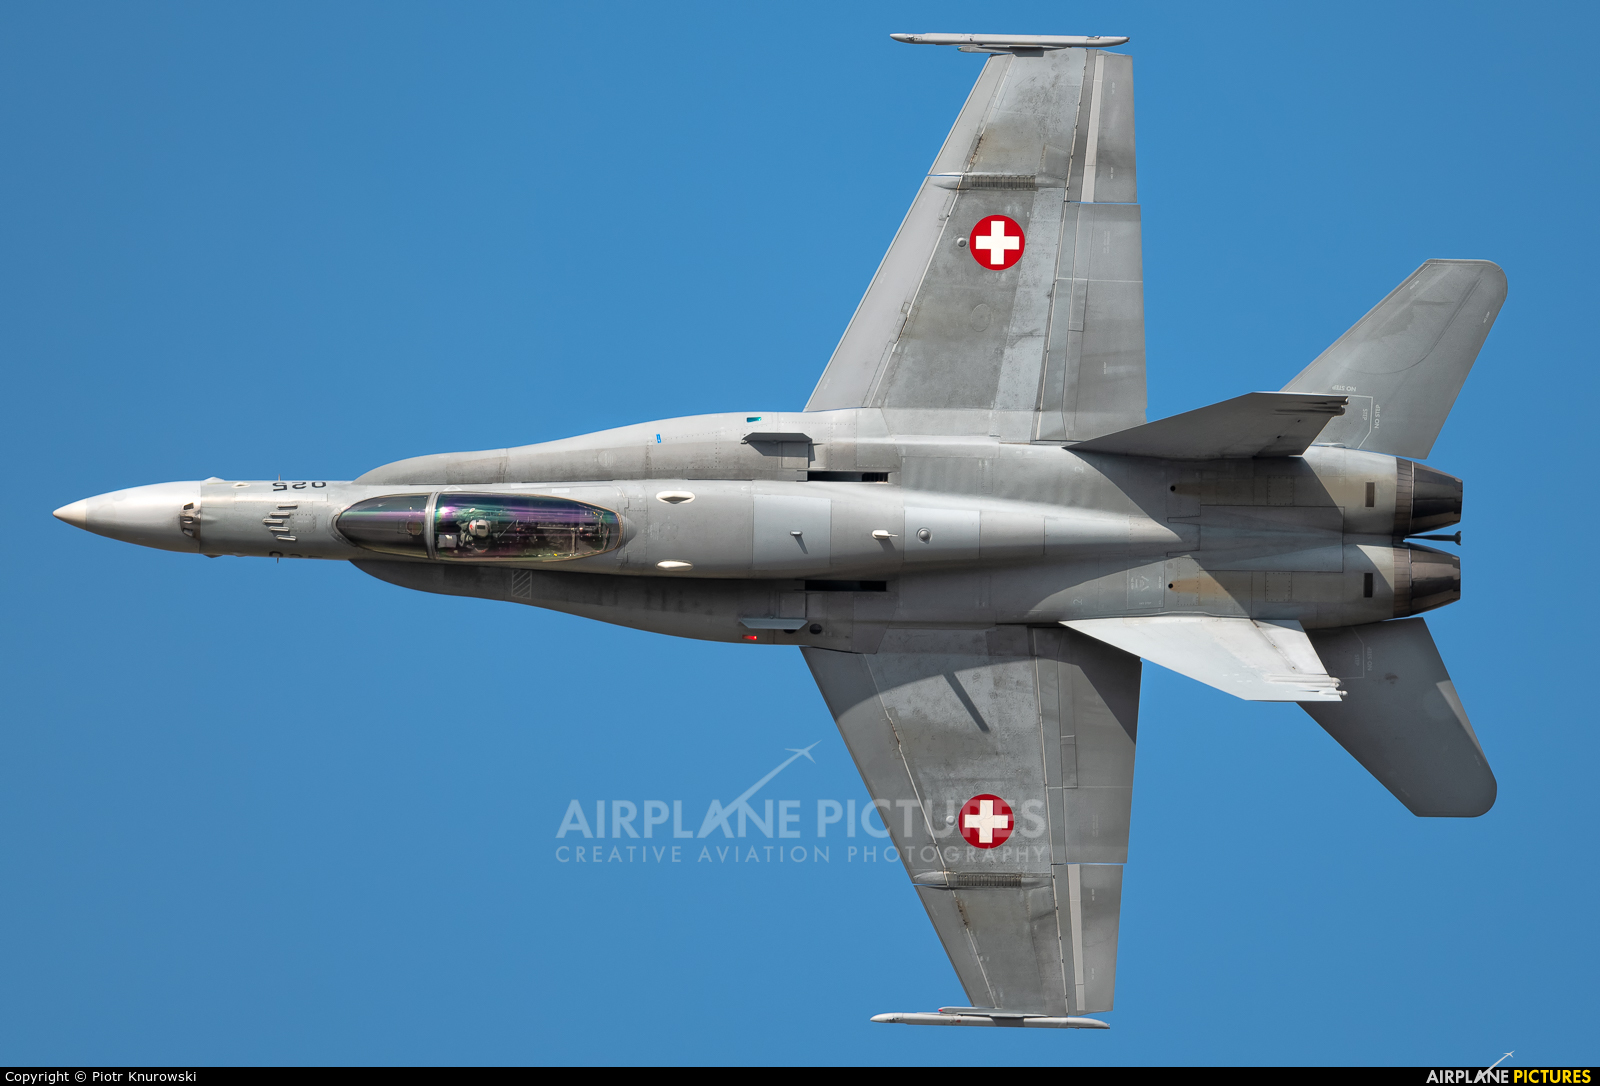 Switzerland - Air Force J-5025 aircraft at Orange - Caritat